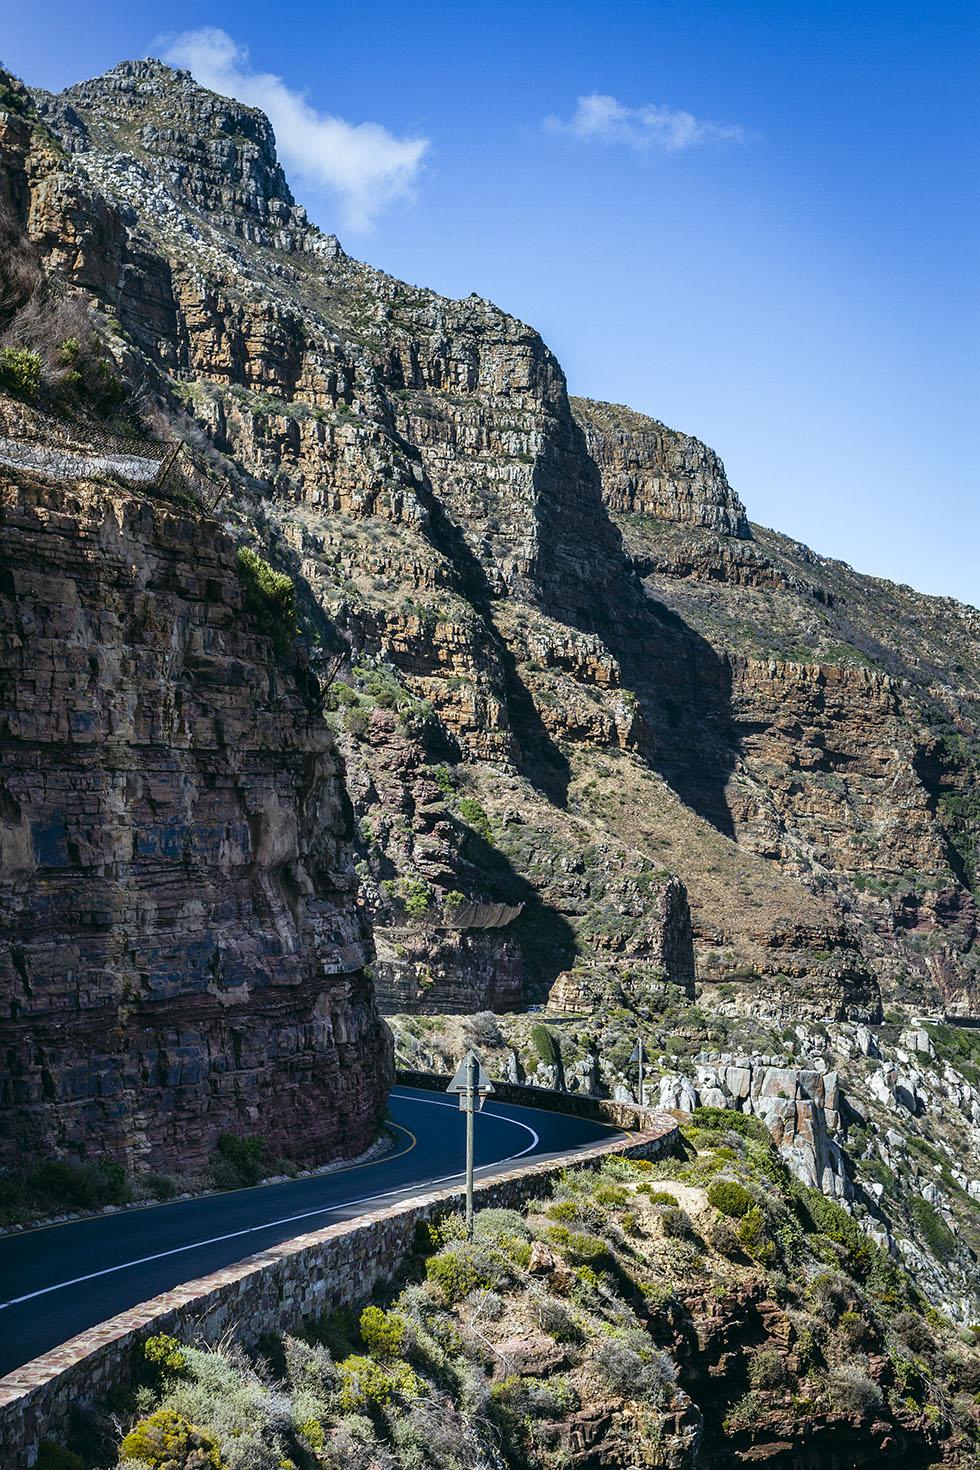 Cape town Chapman's peak drive